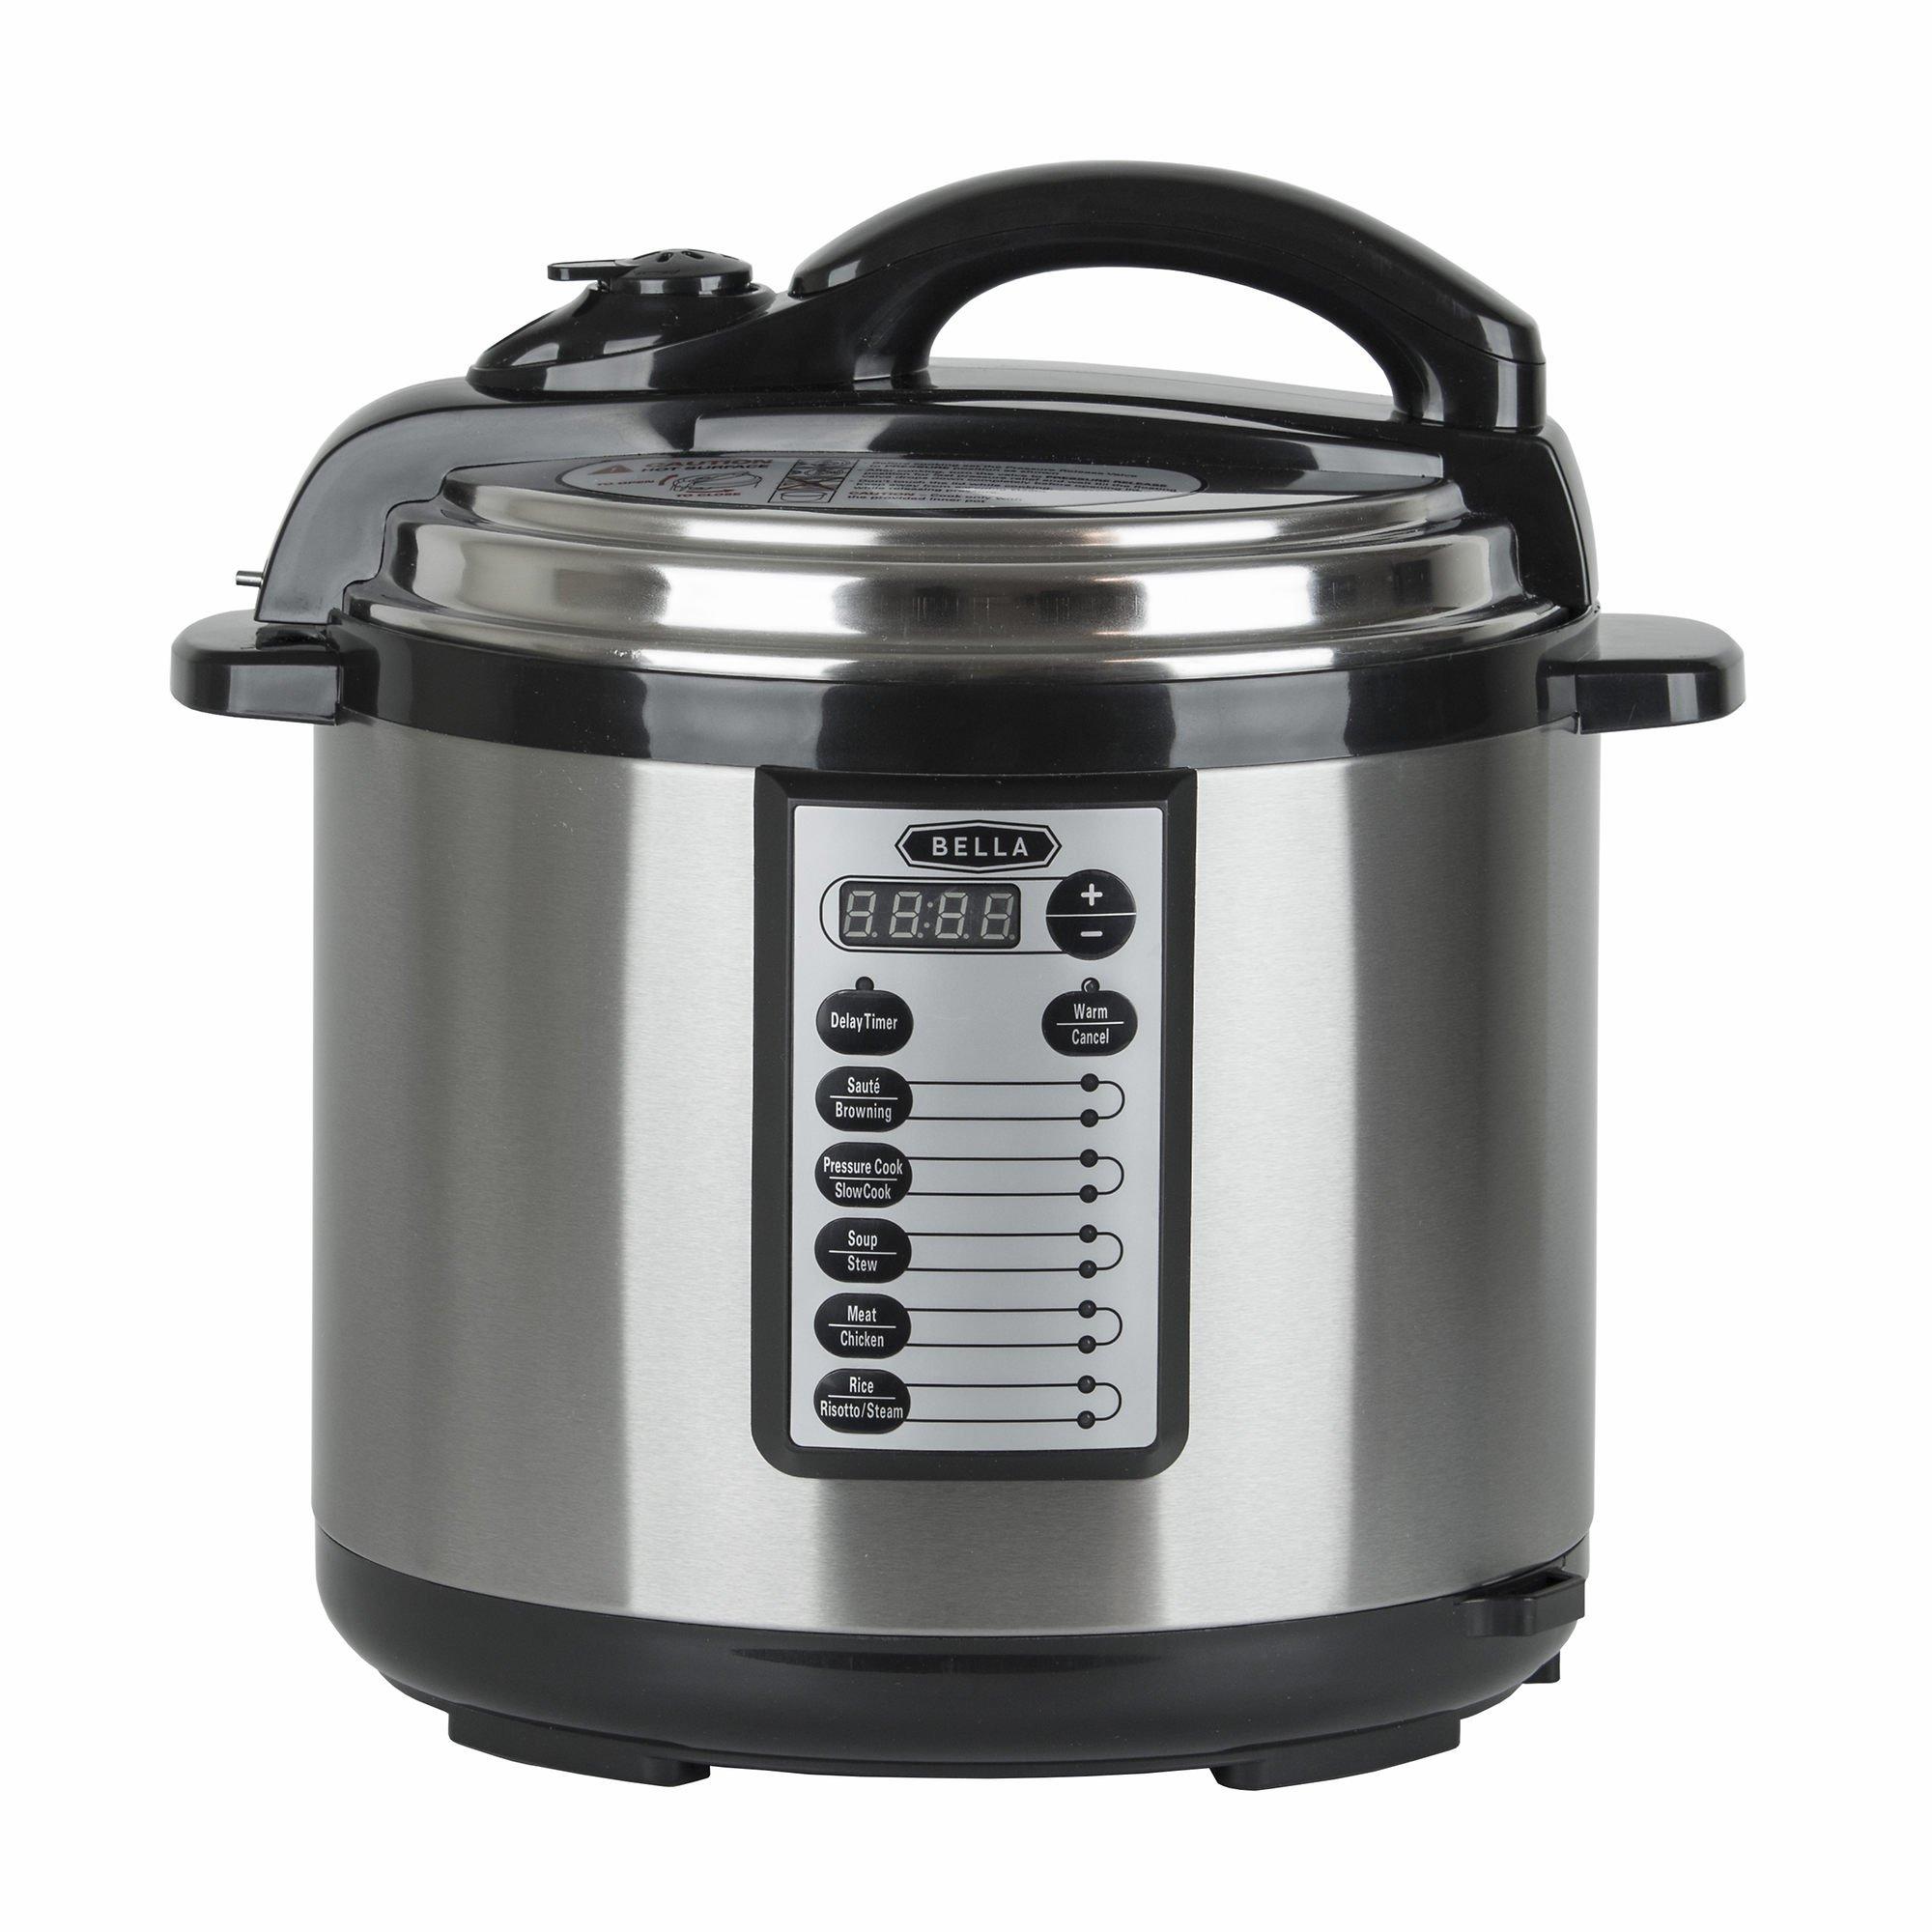 Bella 8-Qt. Pressure Cooker 14595